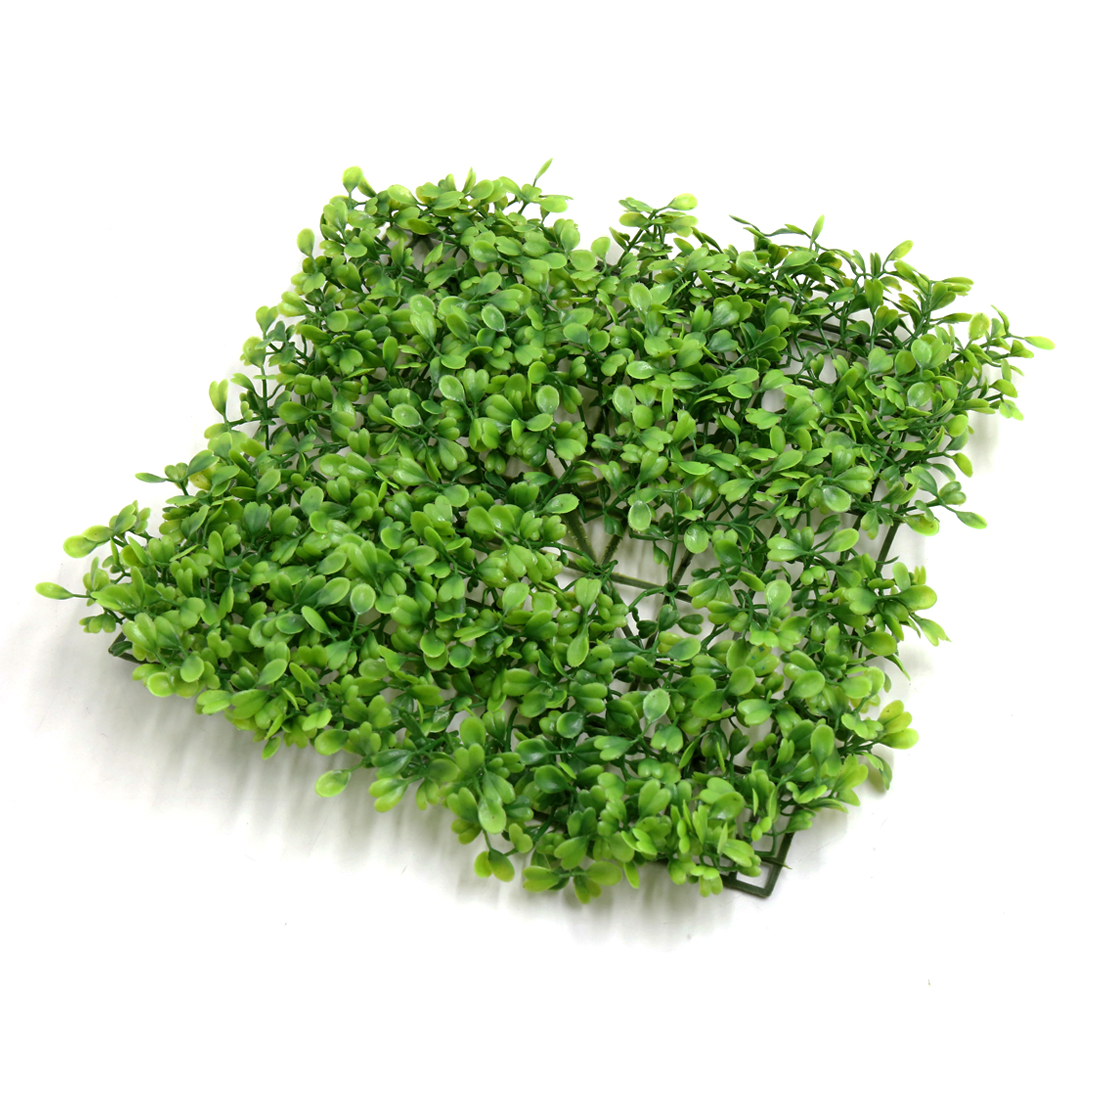 Plastic Grass Lawn Aquarium Tank Underwater Aquascape Ornament